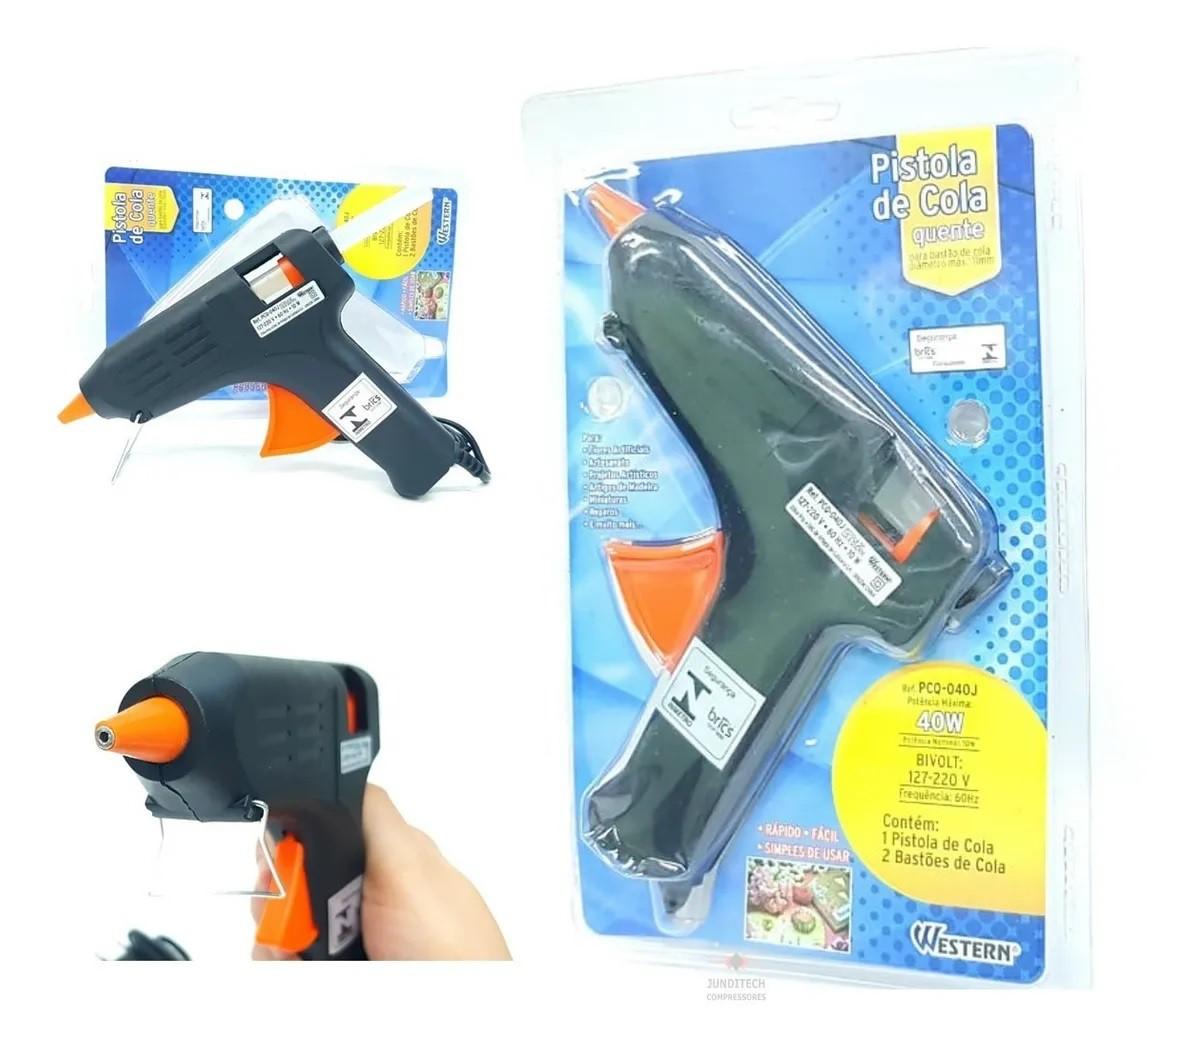 Pistola de Cola Quente 40W Bivolt Western PCQ-040J  - Bastex Artesanatos